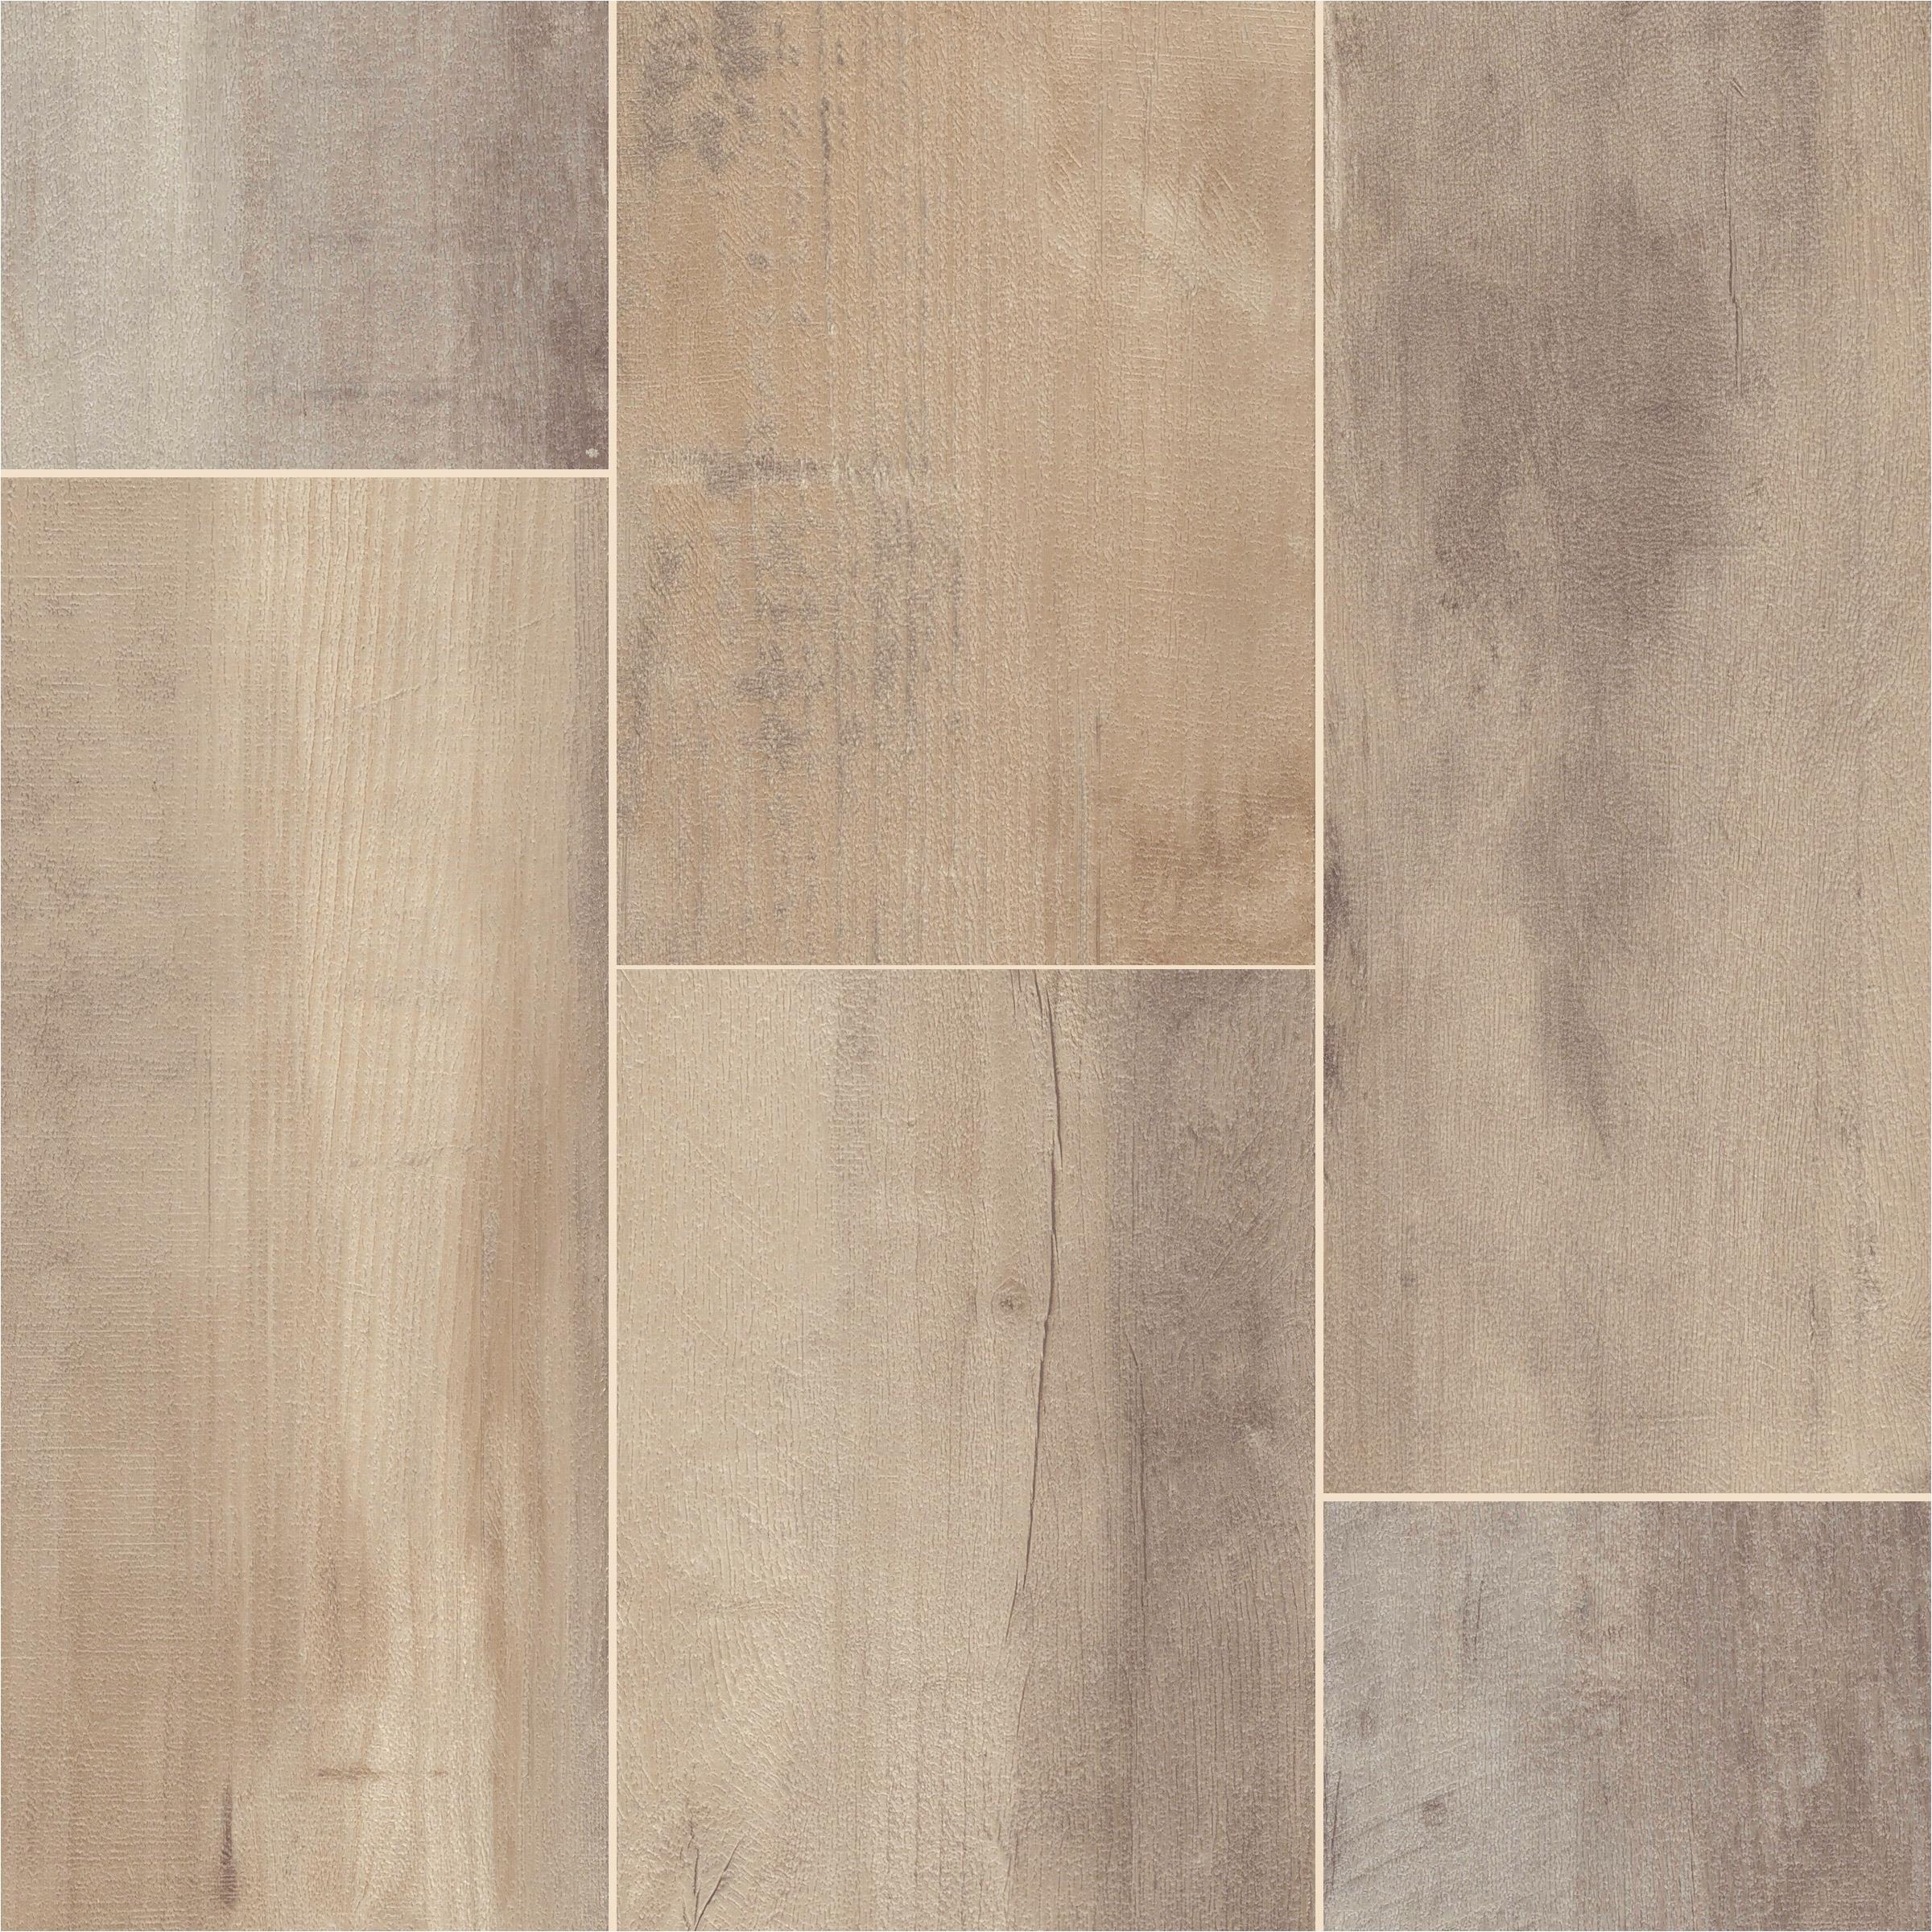 Vinyl Plank Stick Down Flooring Mohawk Frosted Blush 8 78 Wide Glue Down Luxury Vinyl Plank Flooring